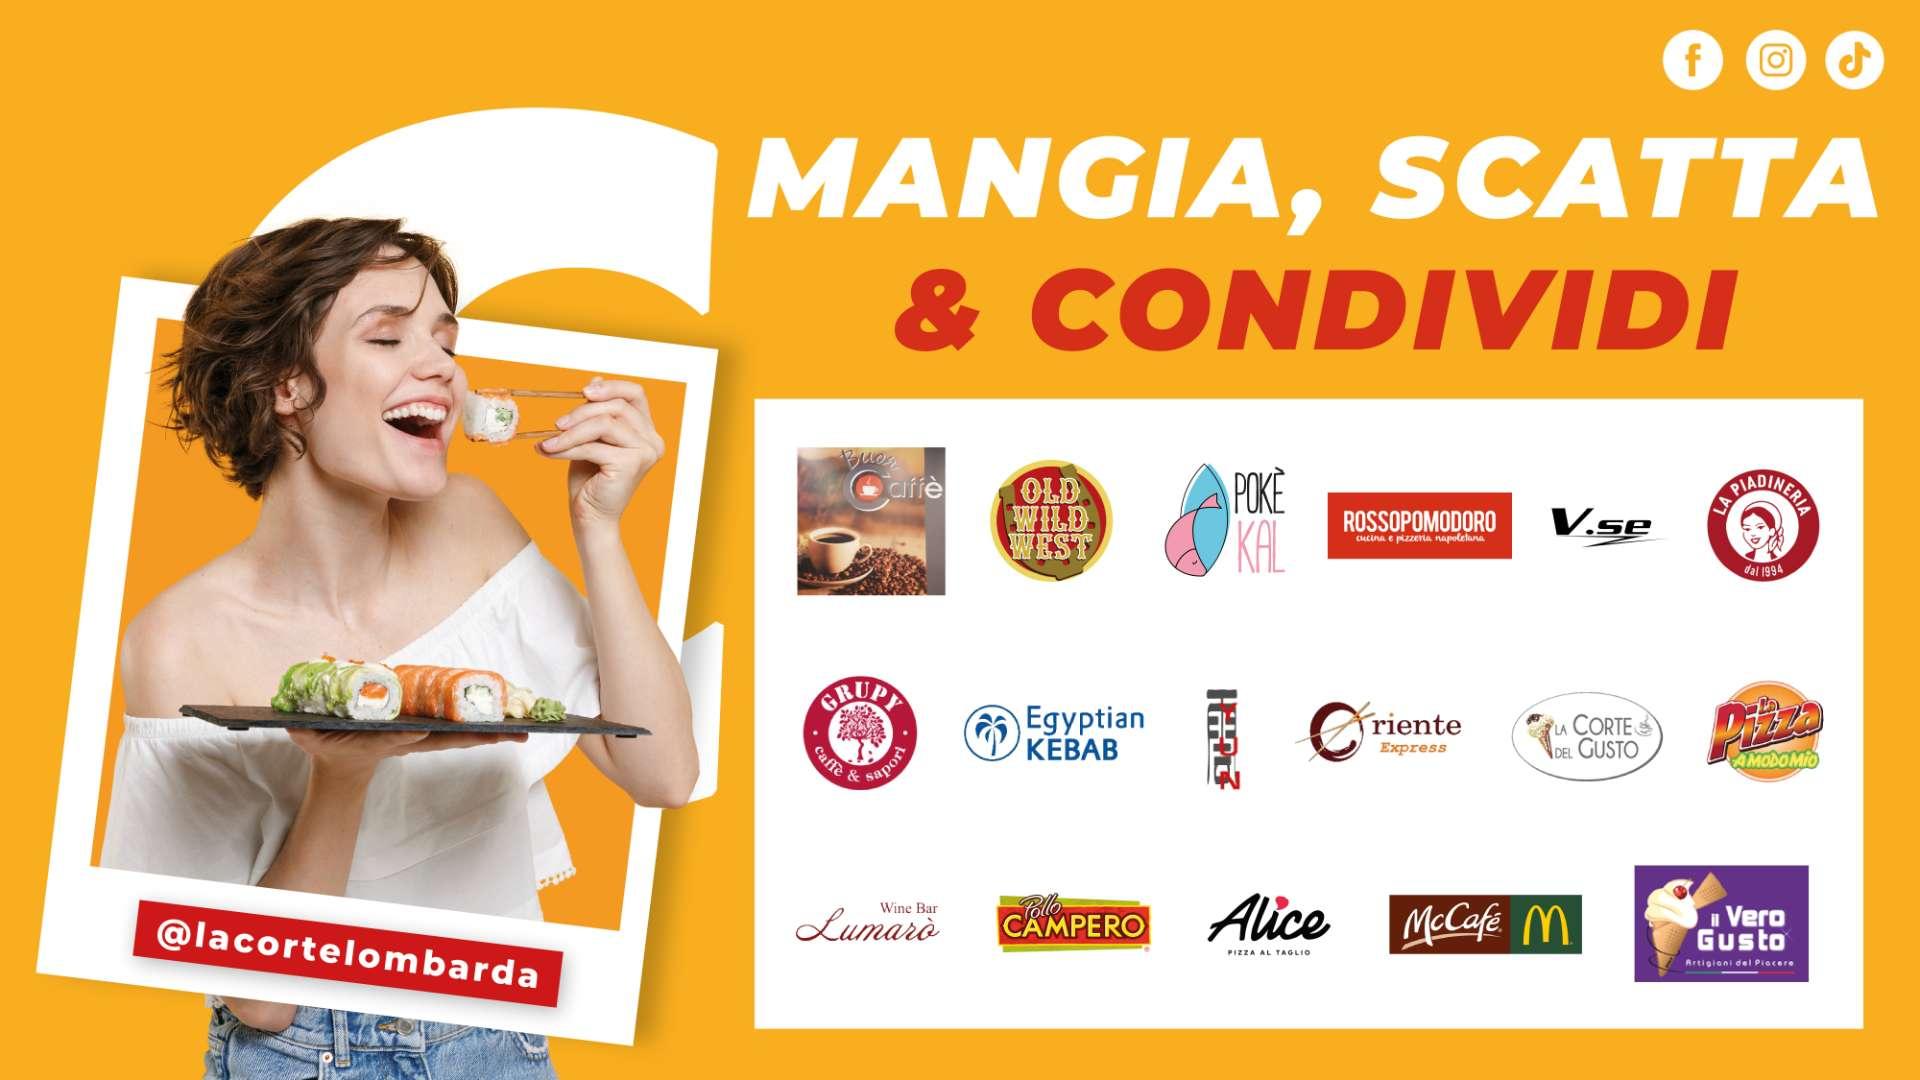 Mangia, Scatta & Condividi